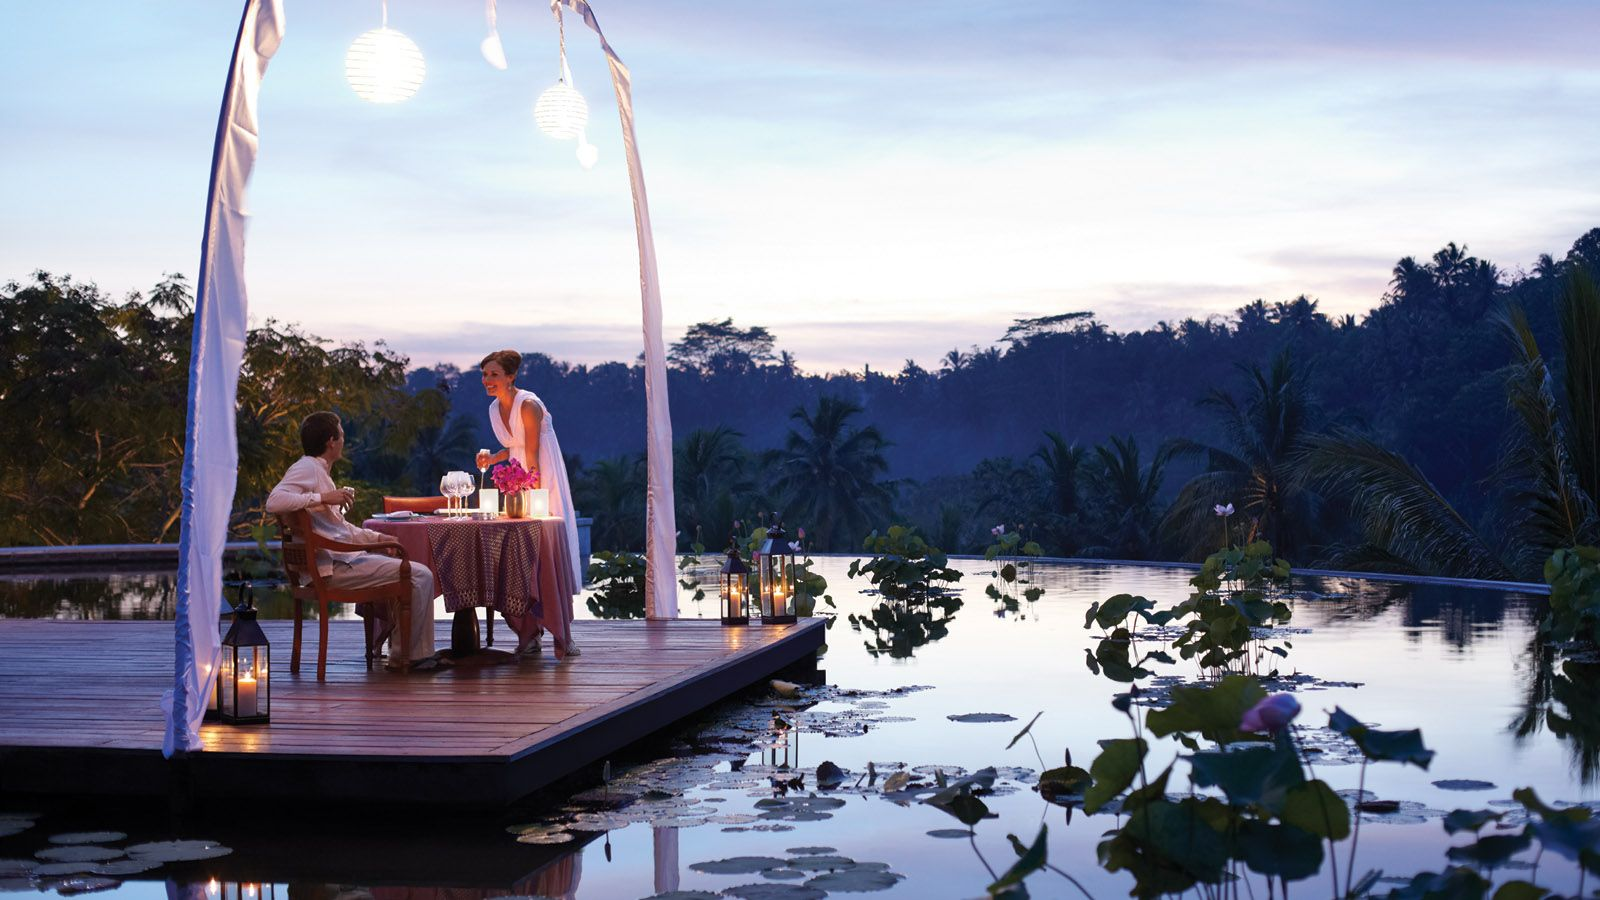 Bali Romantic Honeymoon 5n6d Cherish Holidays In 2020 Romantic Resorts Romantic Honeymoon Bali Honeymoon